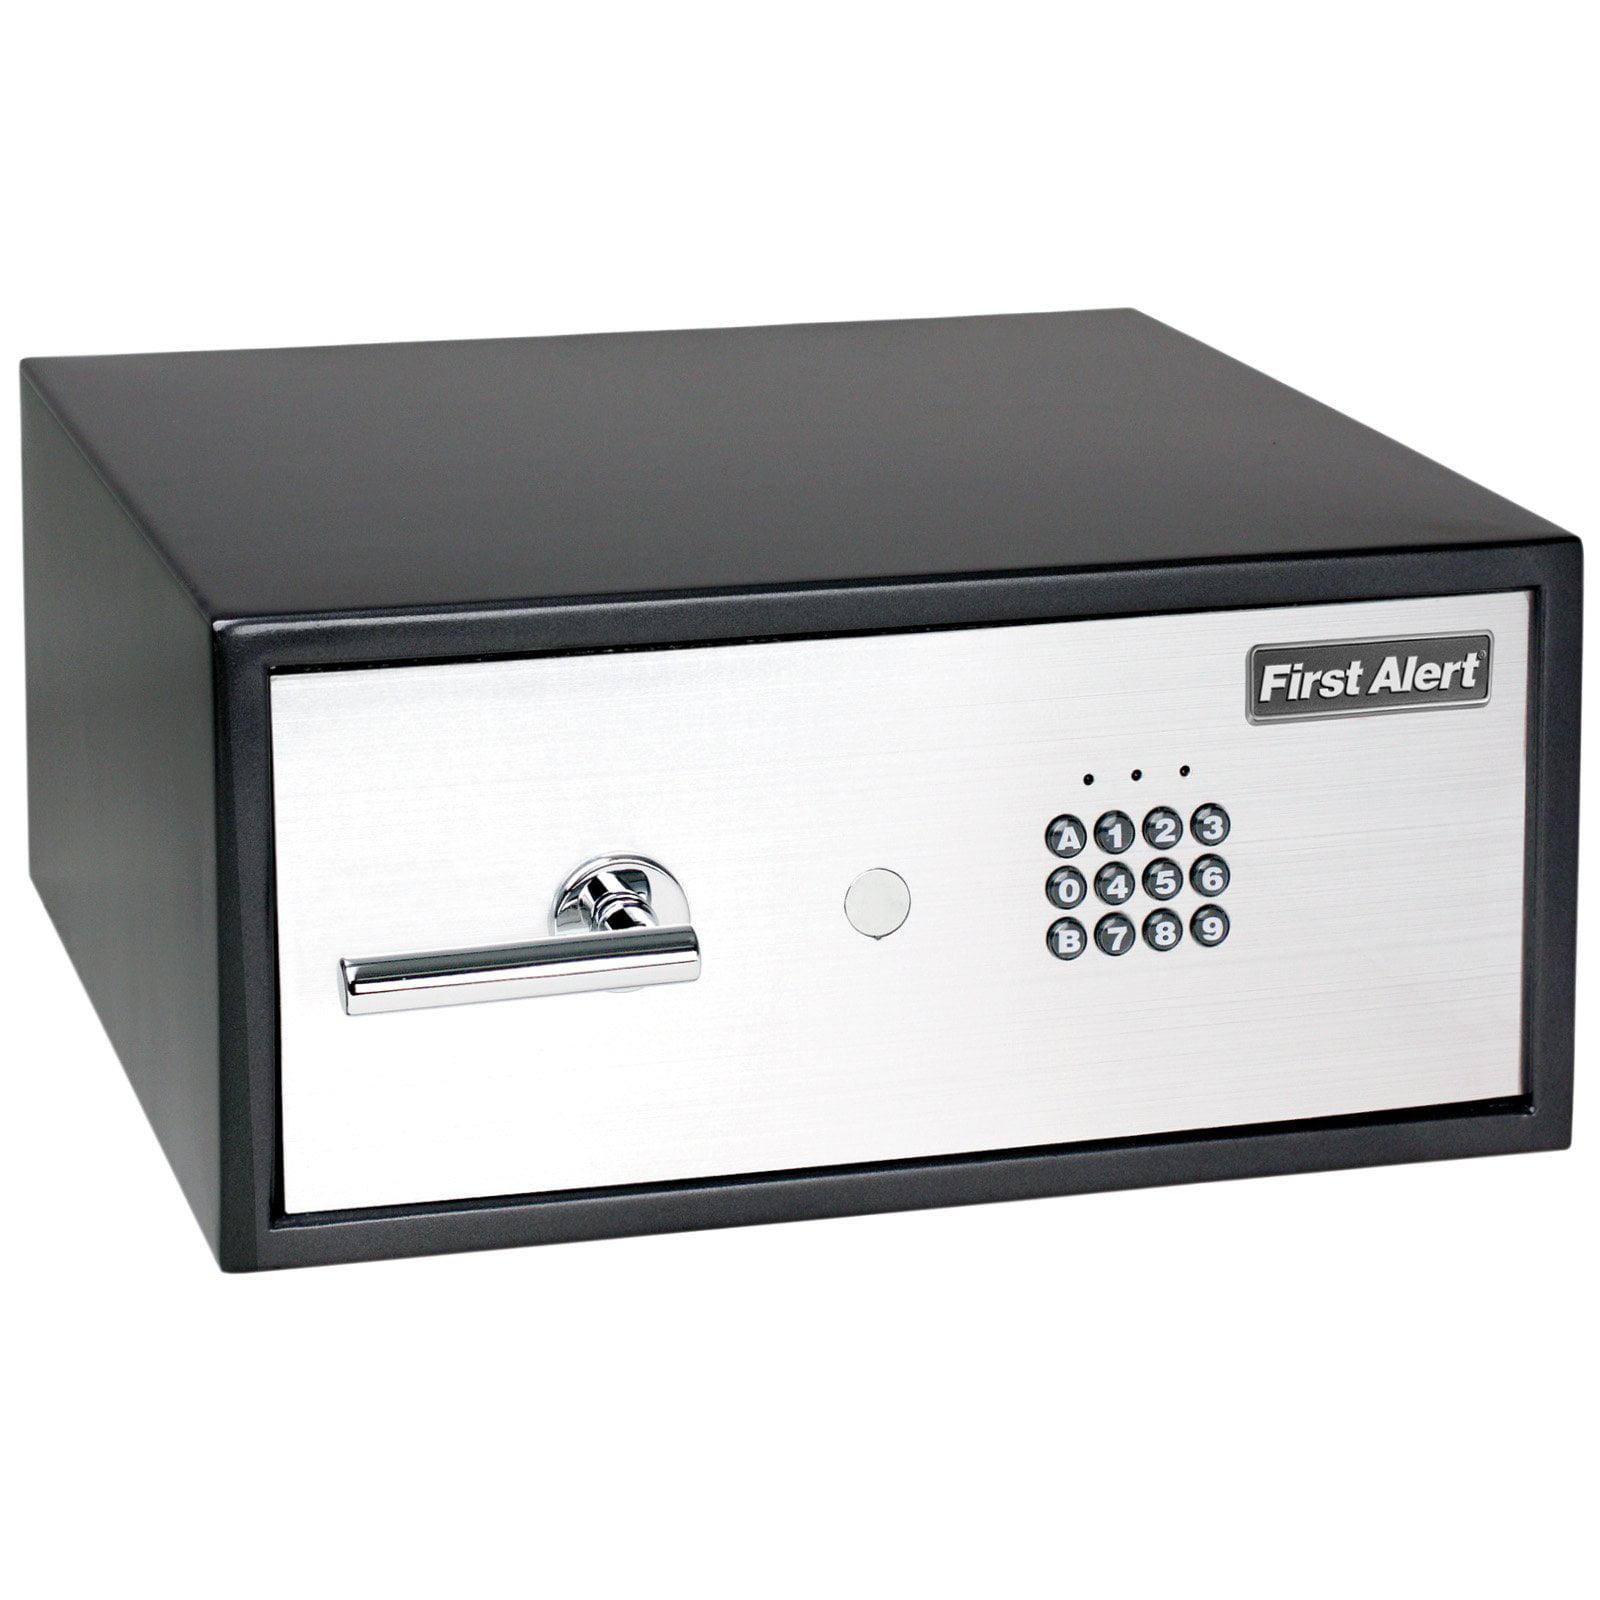 First Alert 2062f 1.04 Cubic Foot Laptop / document Anti - theft Digital